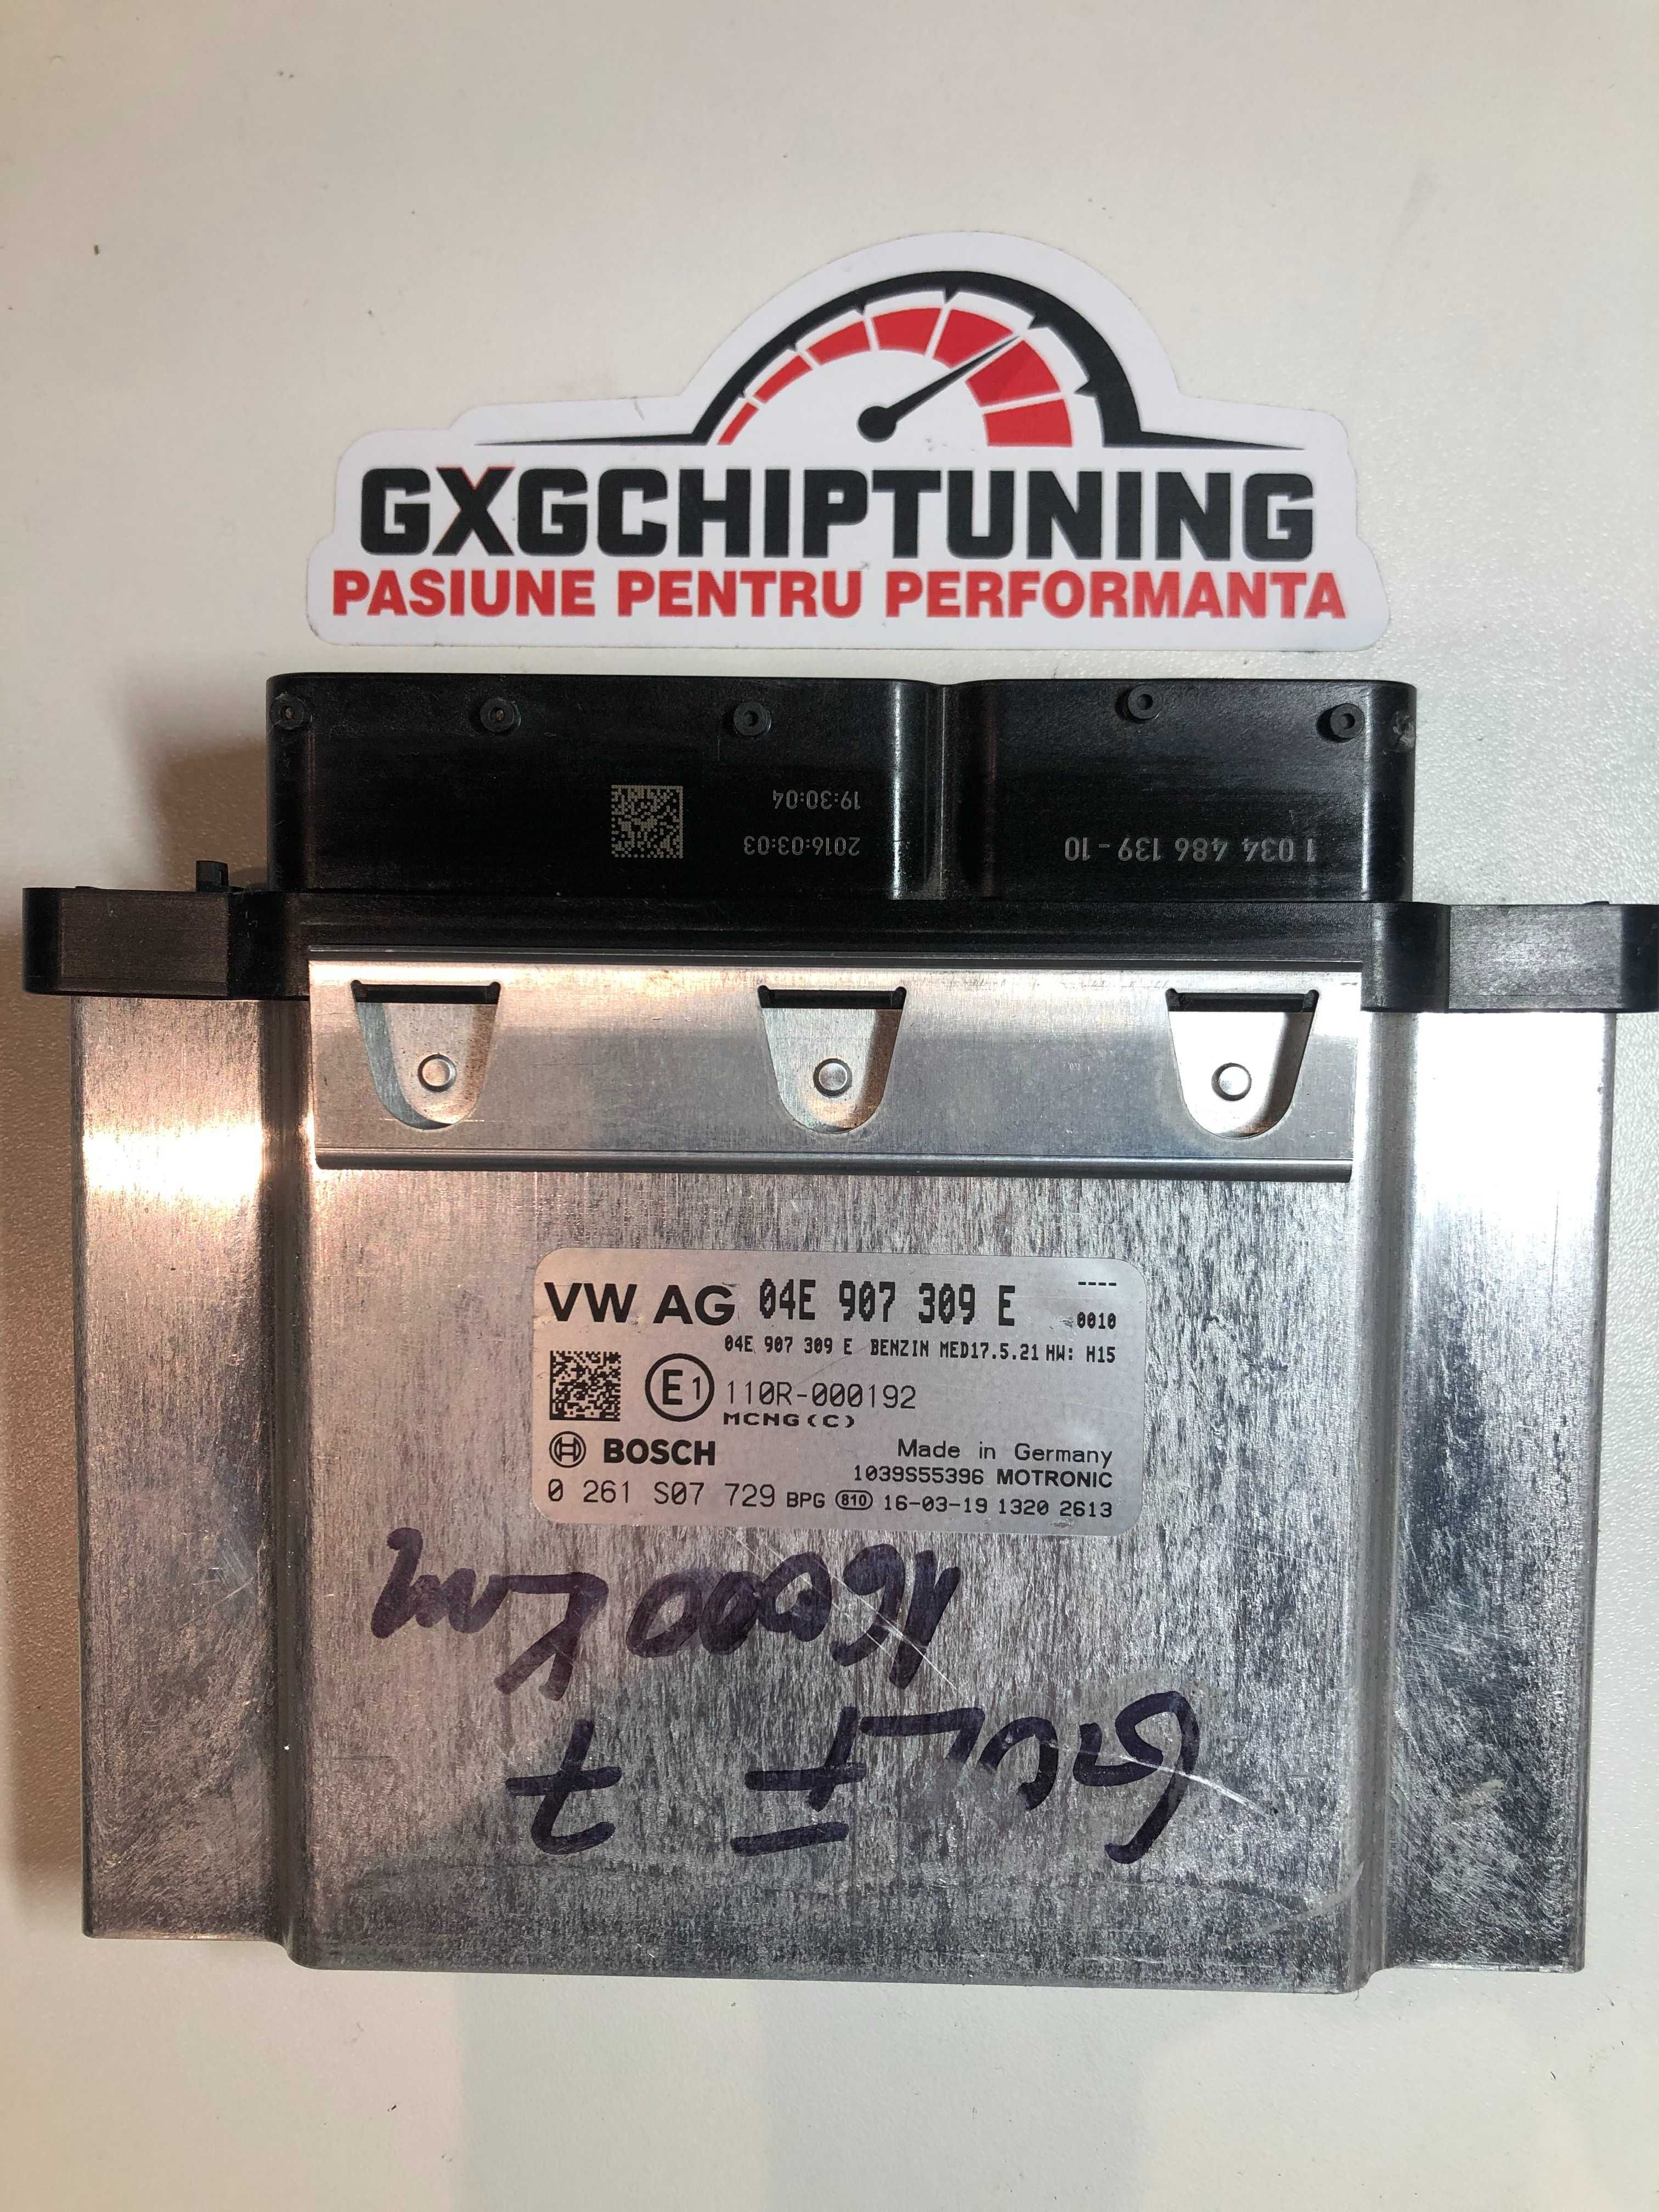 ECU Calculator motor VW Golf7 1.4tsi 04E907309E 0261S07729 MED17.5.21